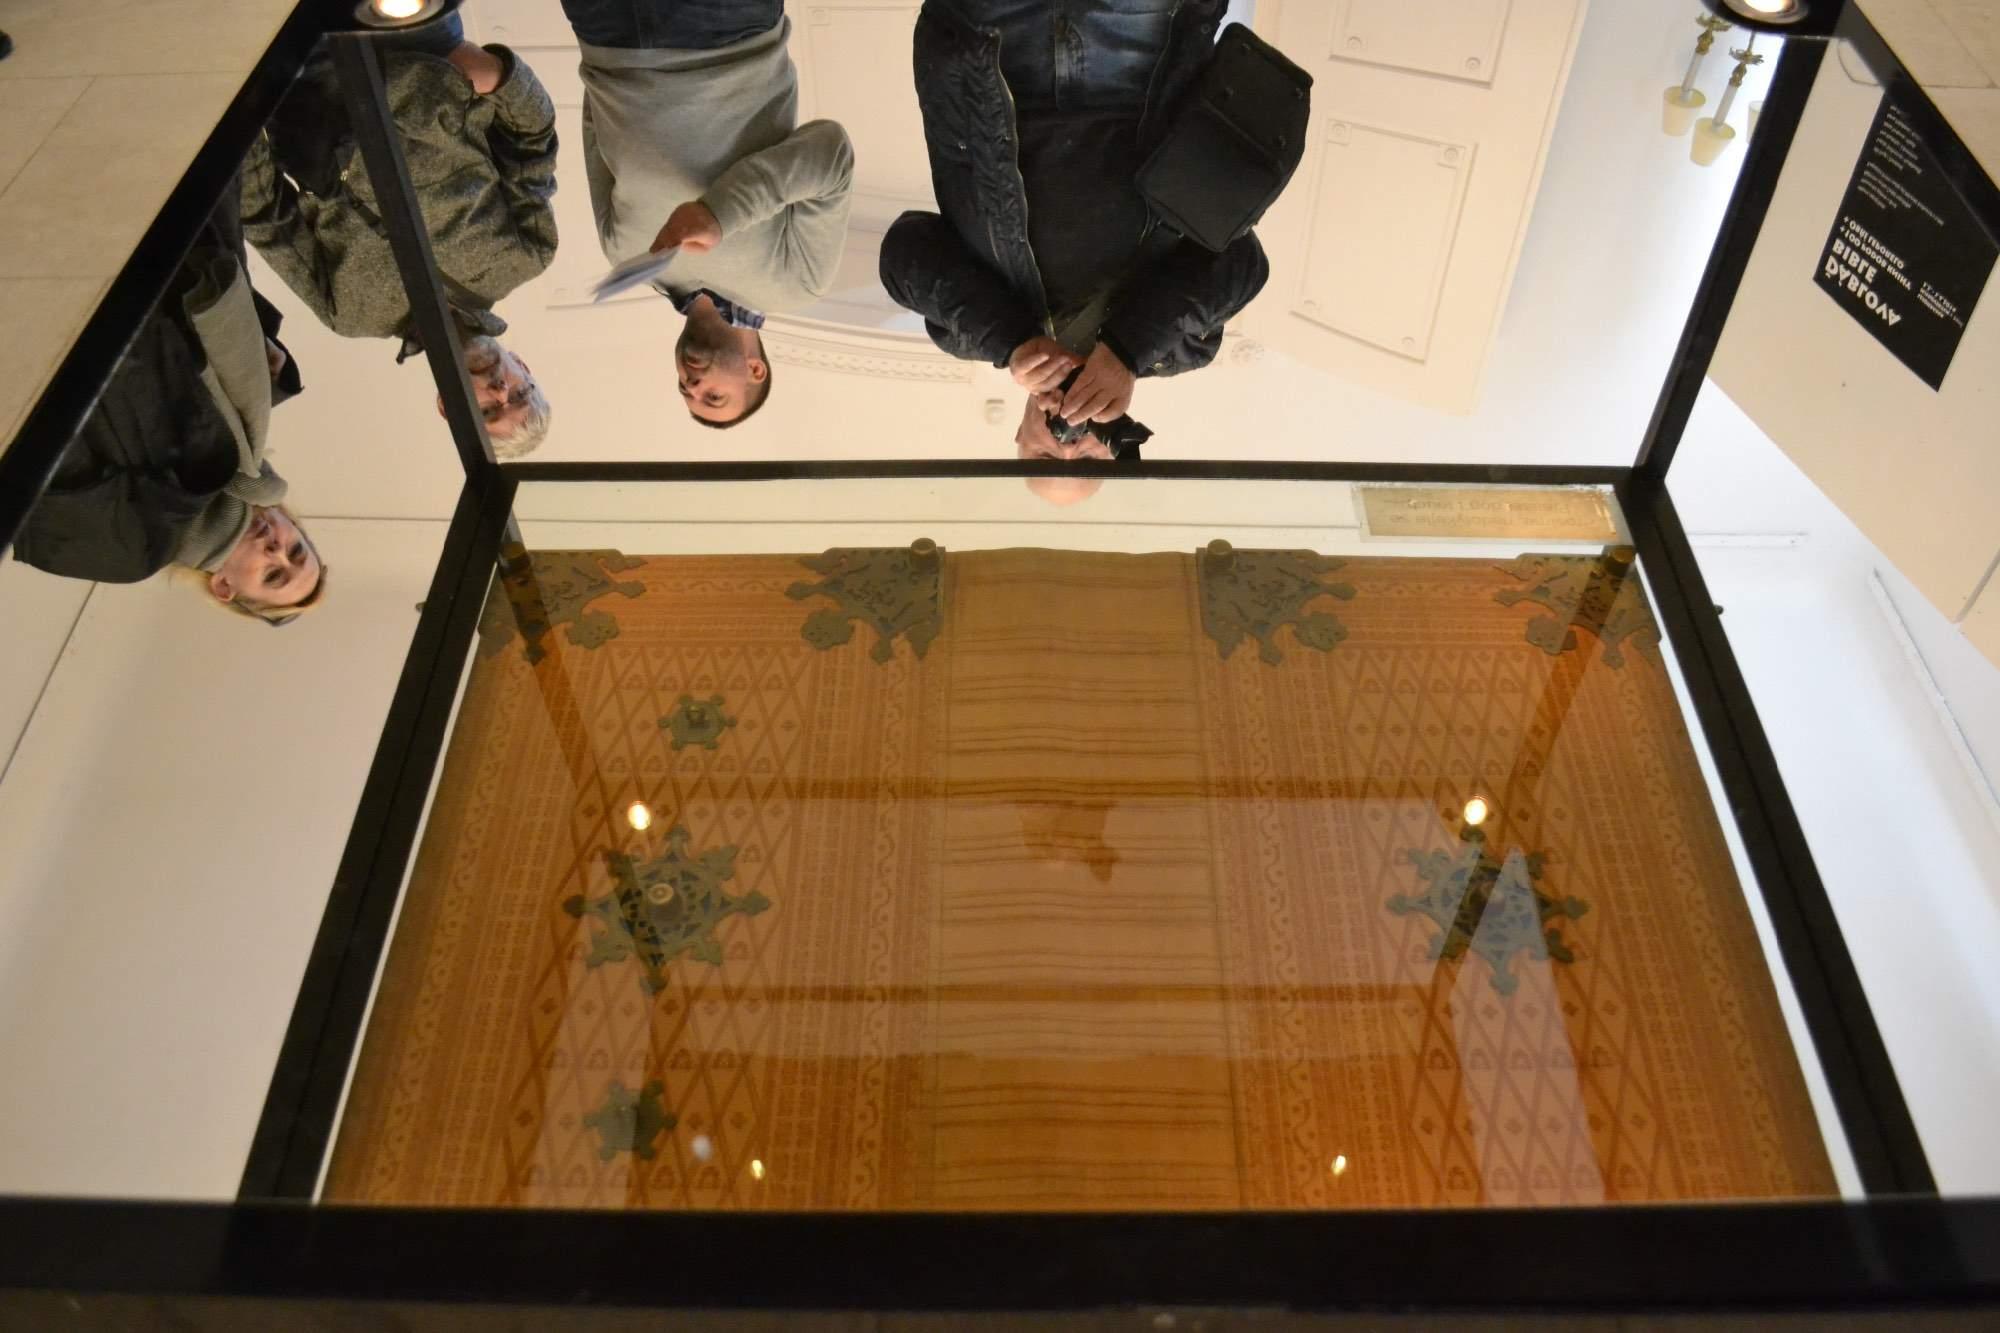 Zrcadlově zobrazená obálka Codexu gigas, Foto: Kateřina Paraiová